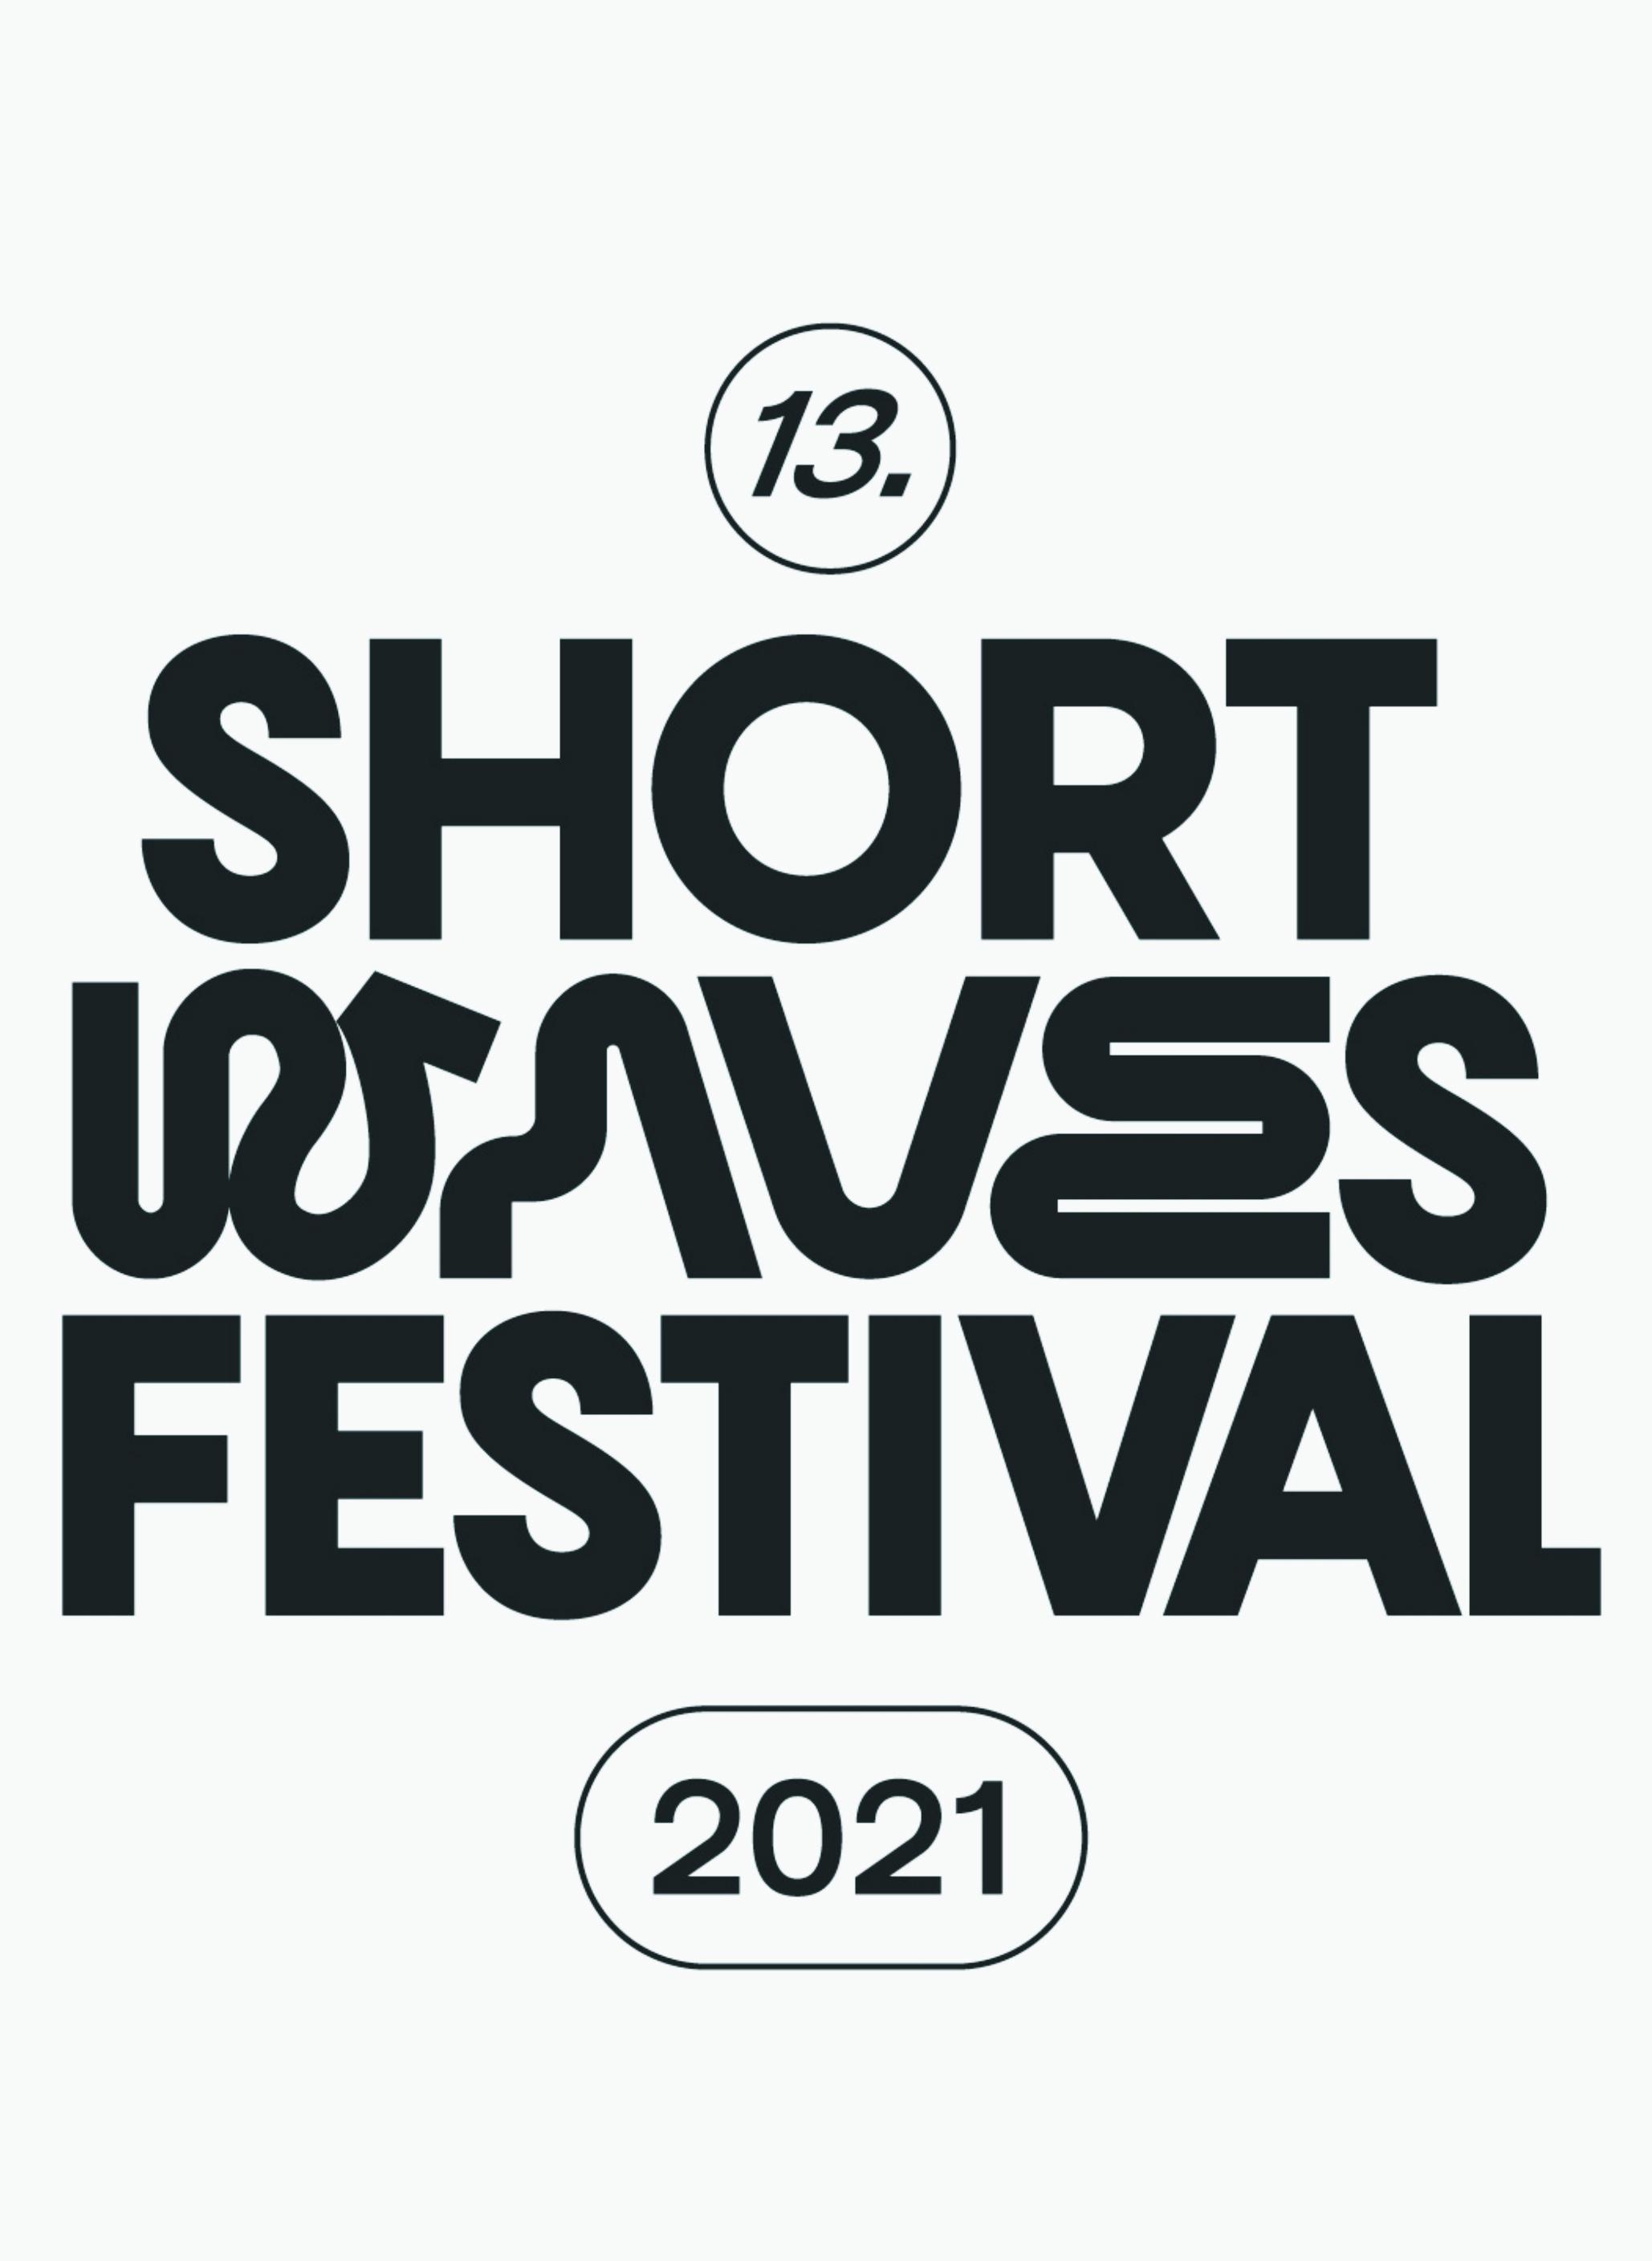 Short Waves Festival 2021 - Urban View II